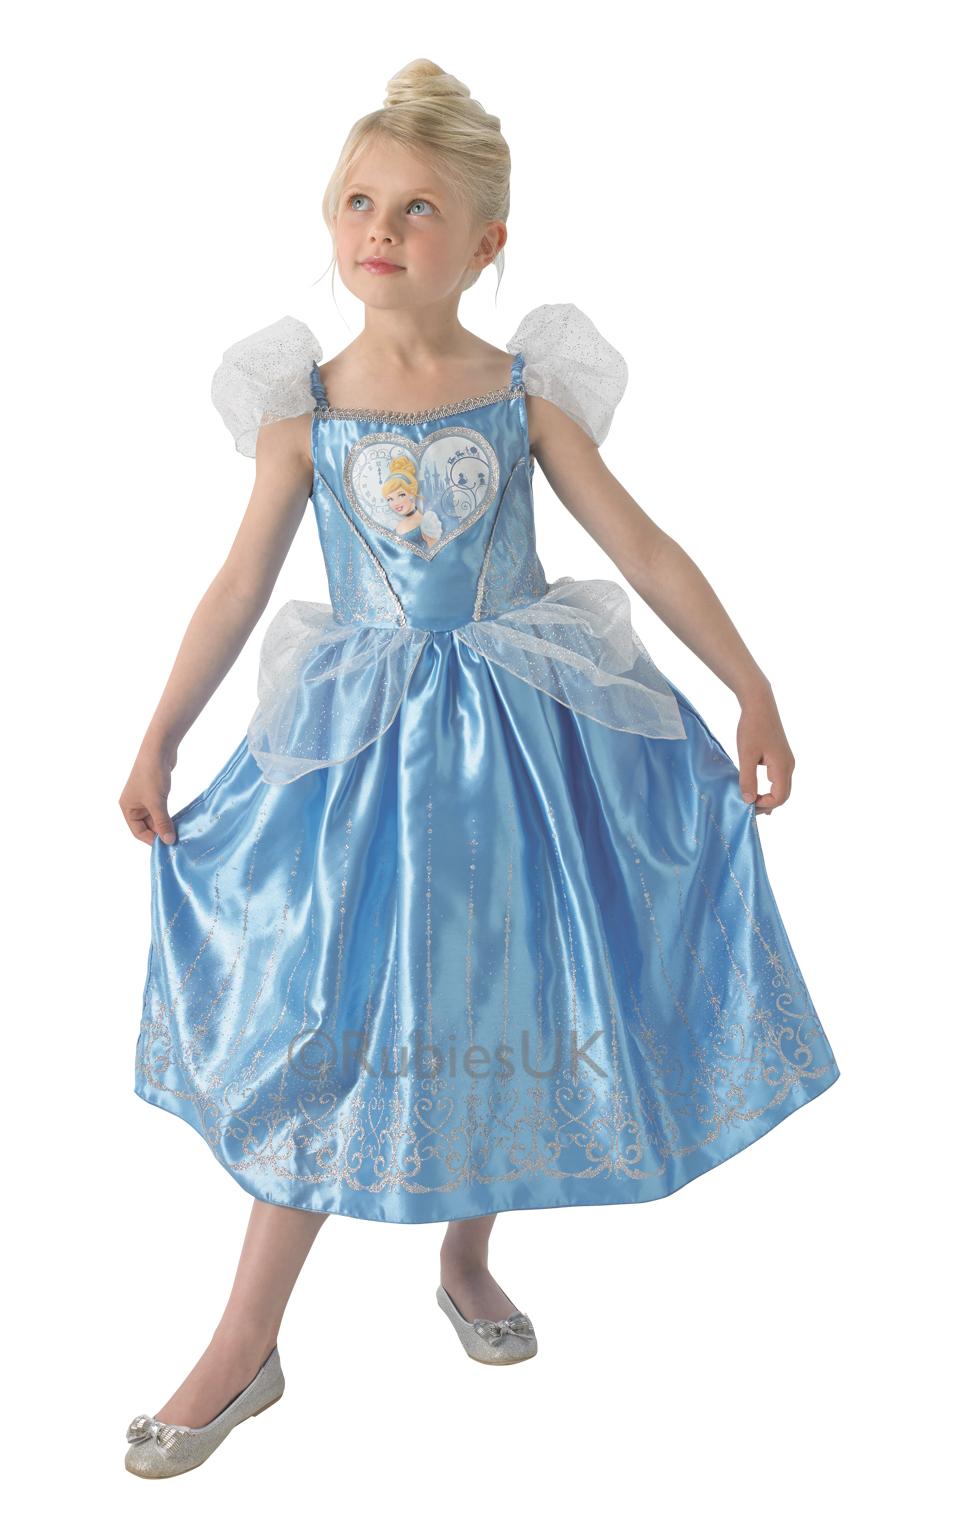 cinderella dress for kids - photo #28